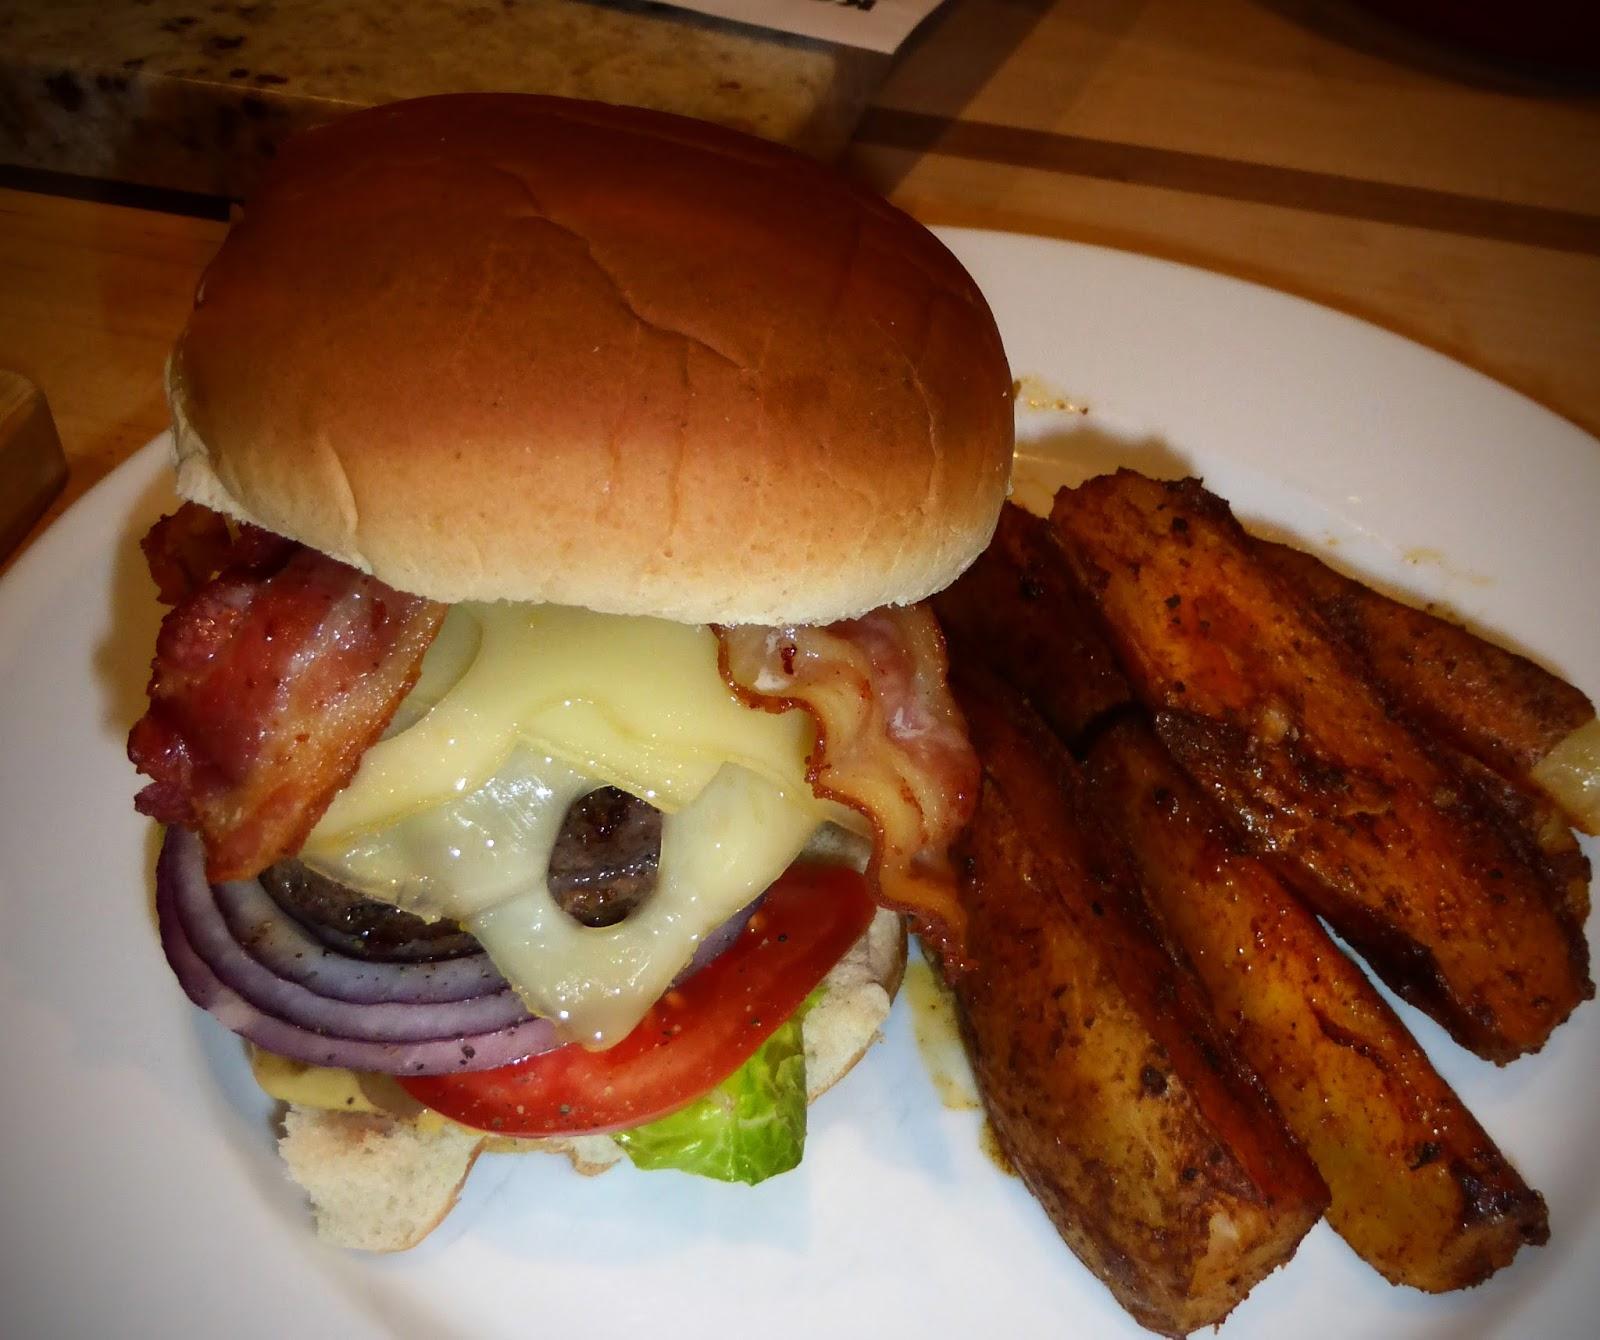 James Walsh Food And Movie Diary: Bacon Cheeseburgers ...